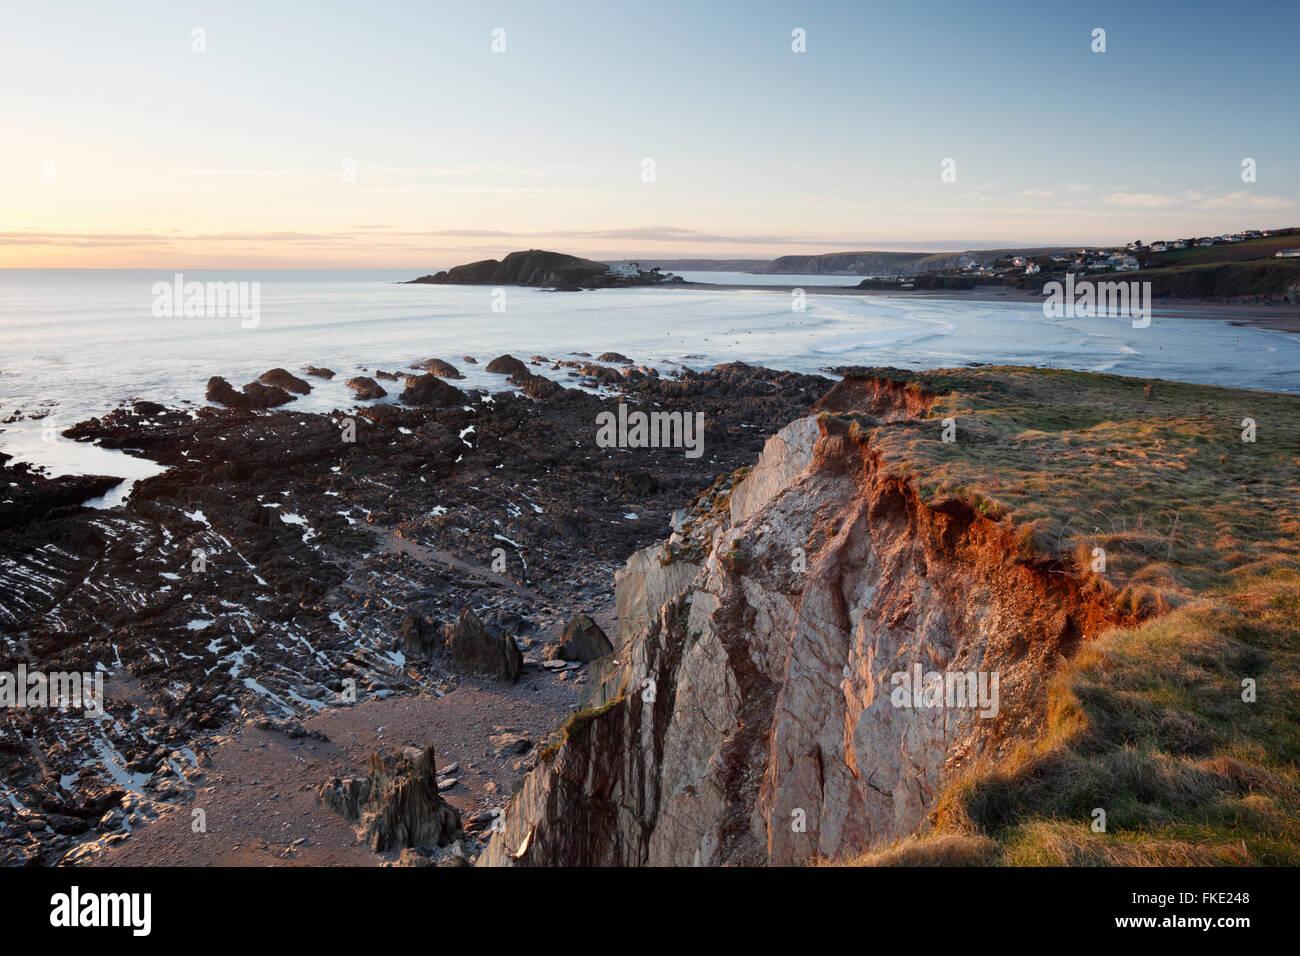 Bigbury Bay and Burgh Island. South Hams. Devon. UK. - Stock Image